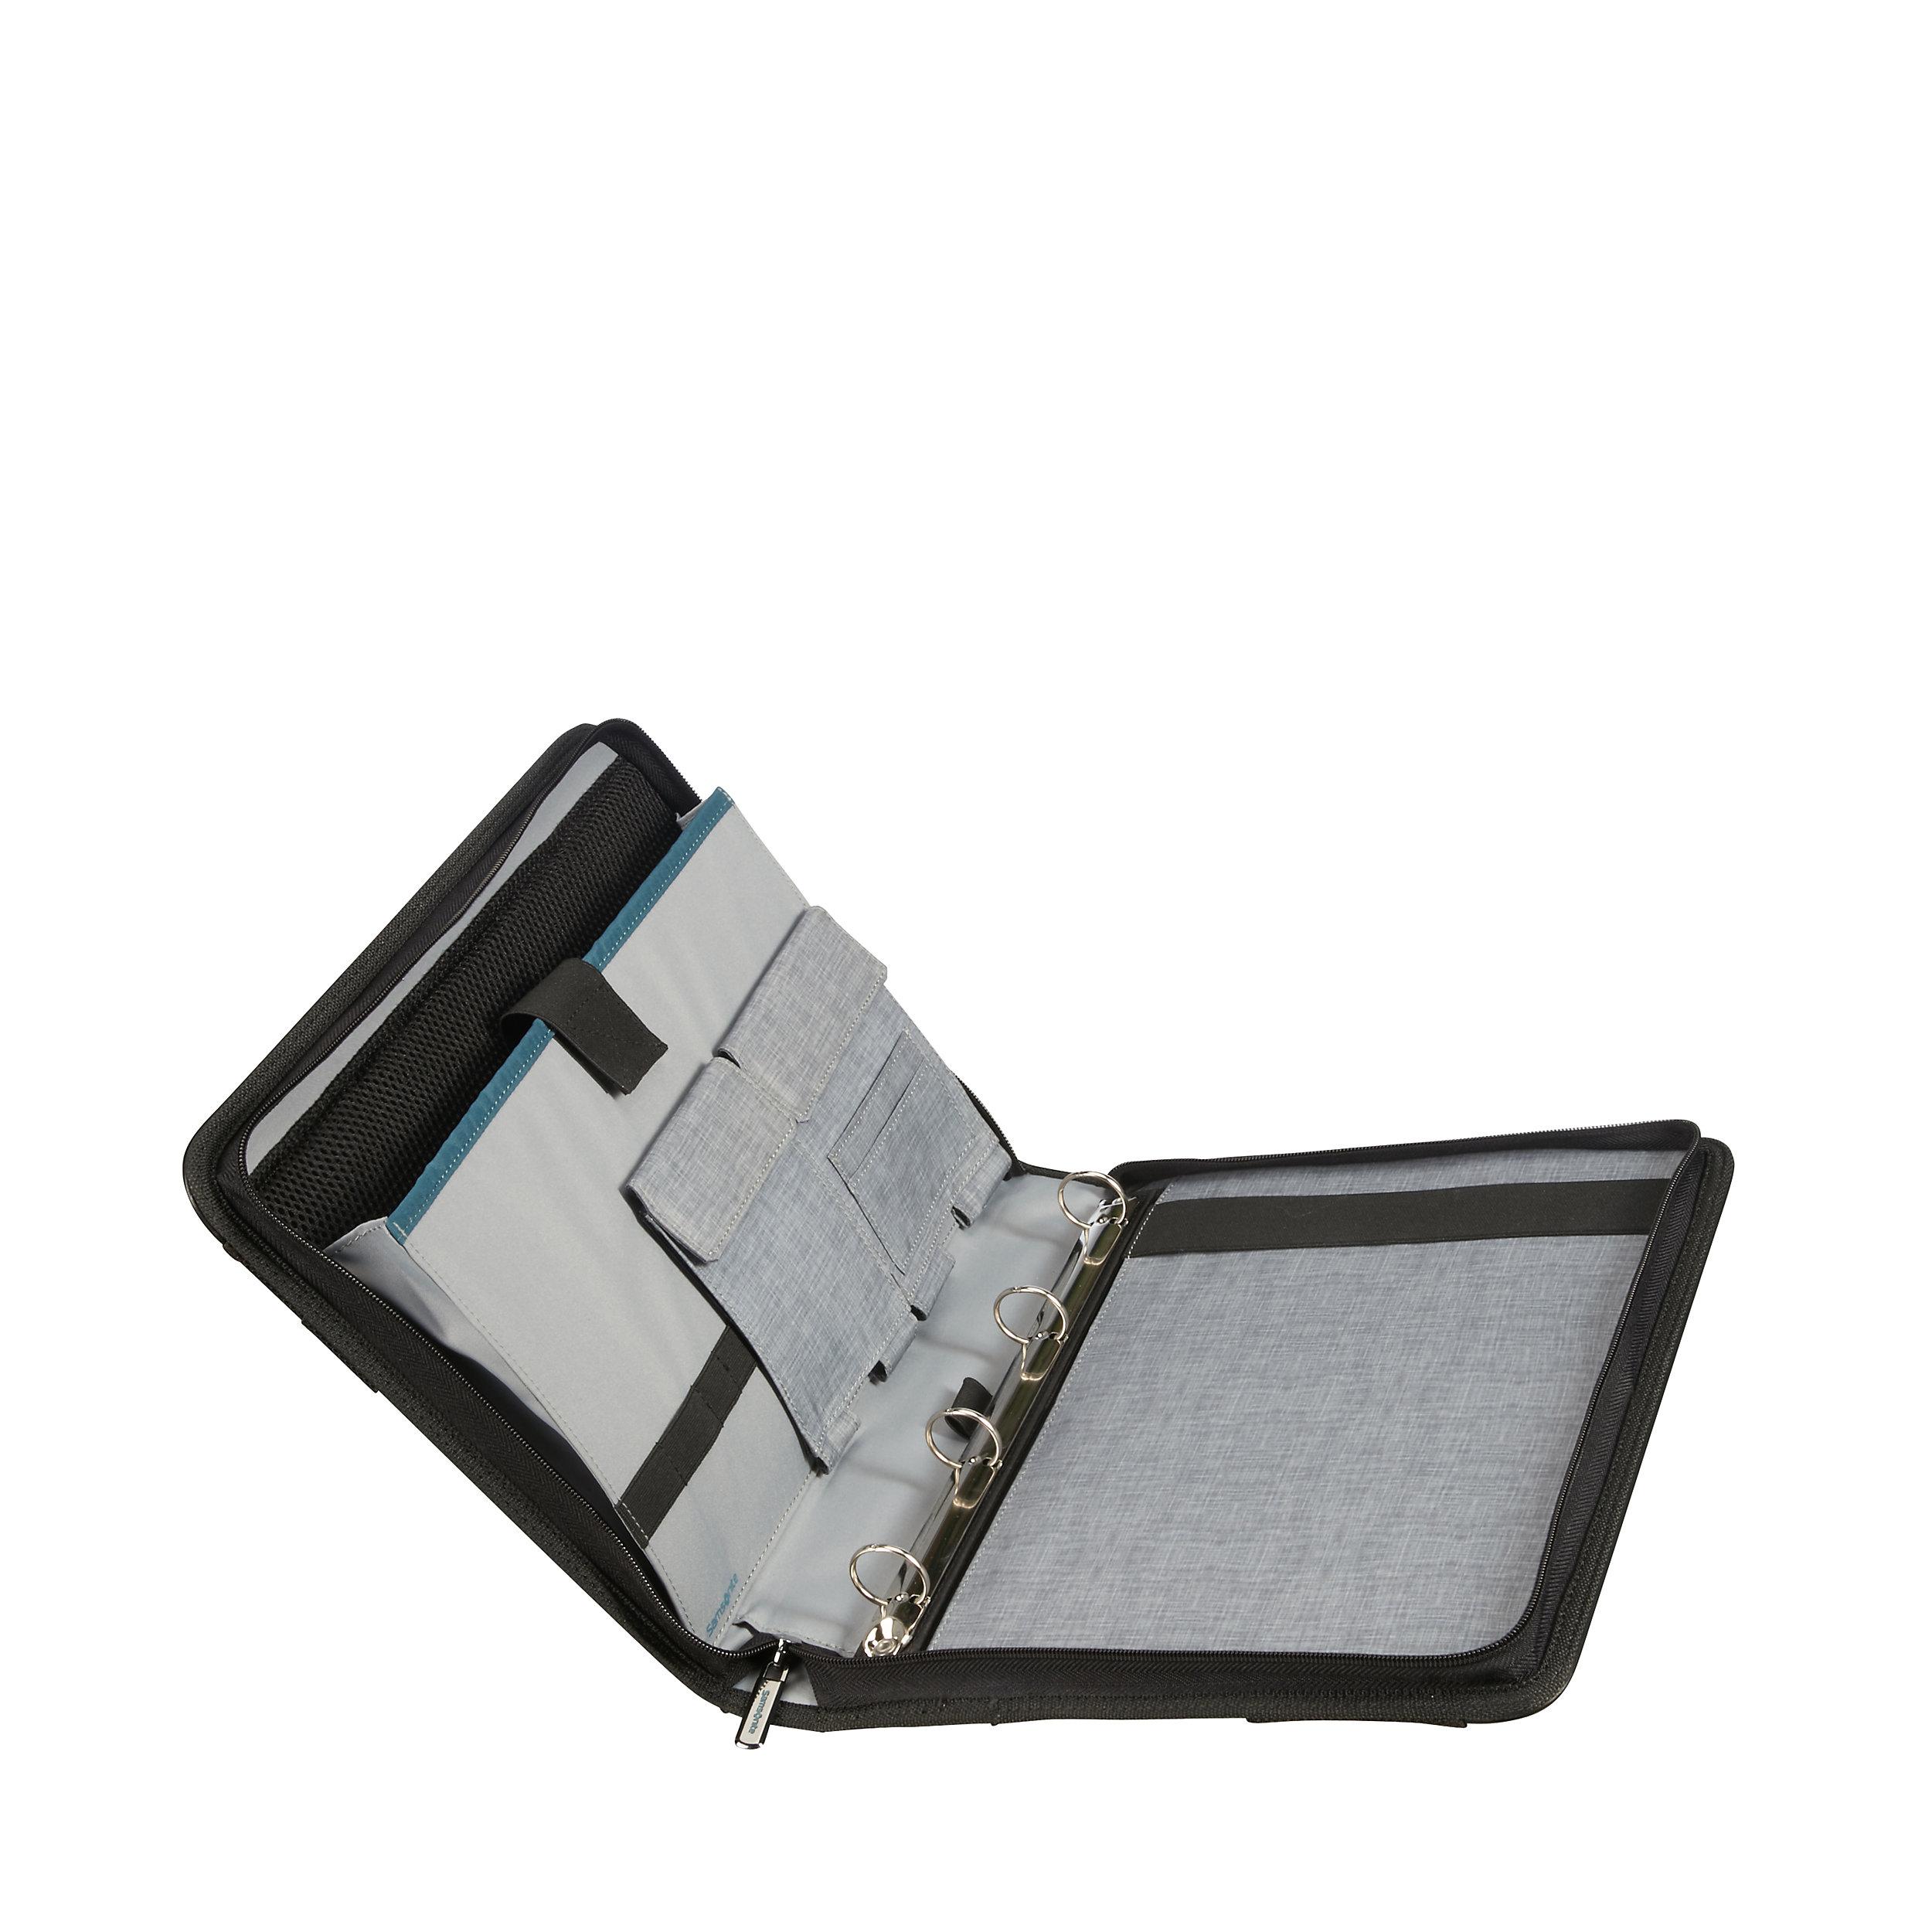 "RV-Schreibmappe m. Ringsystem DIN A4 10,5"" Stationary Spectrolite 2.0 4.7 Liter"